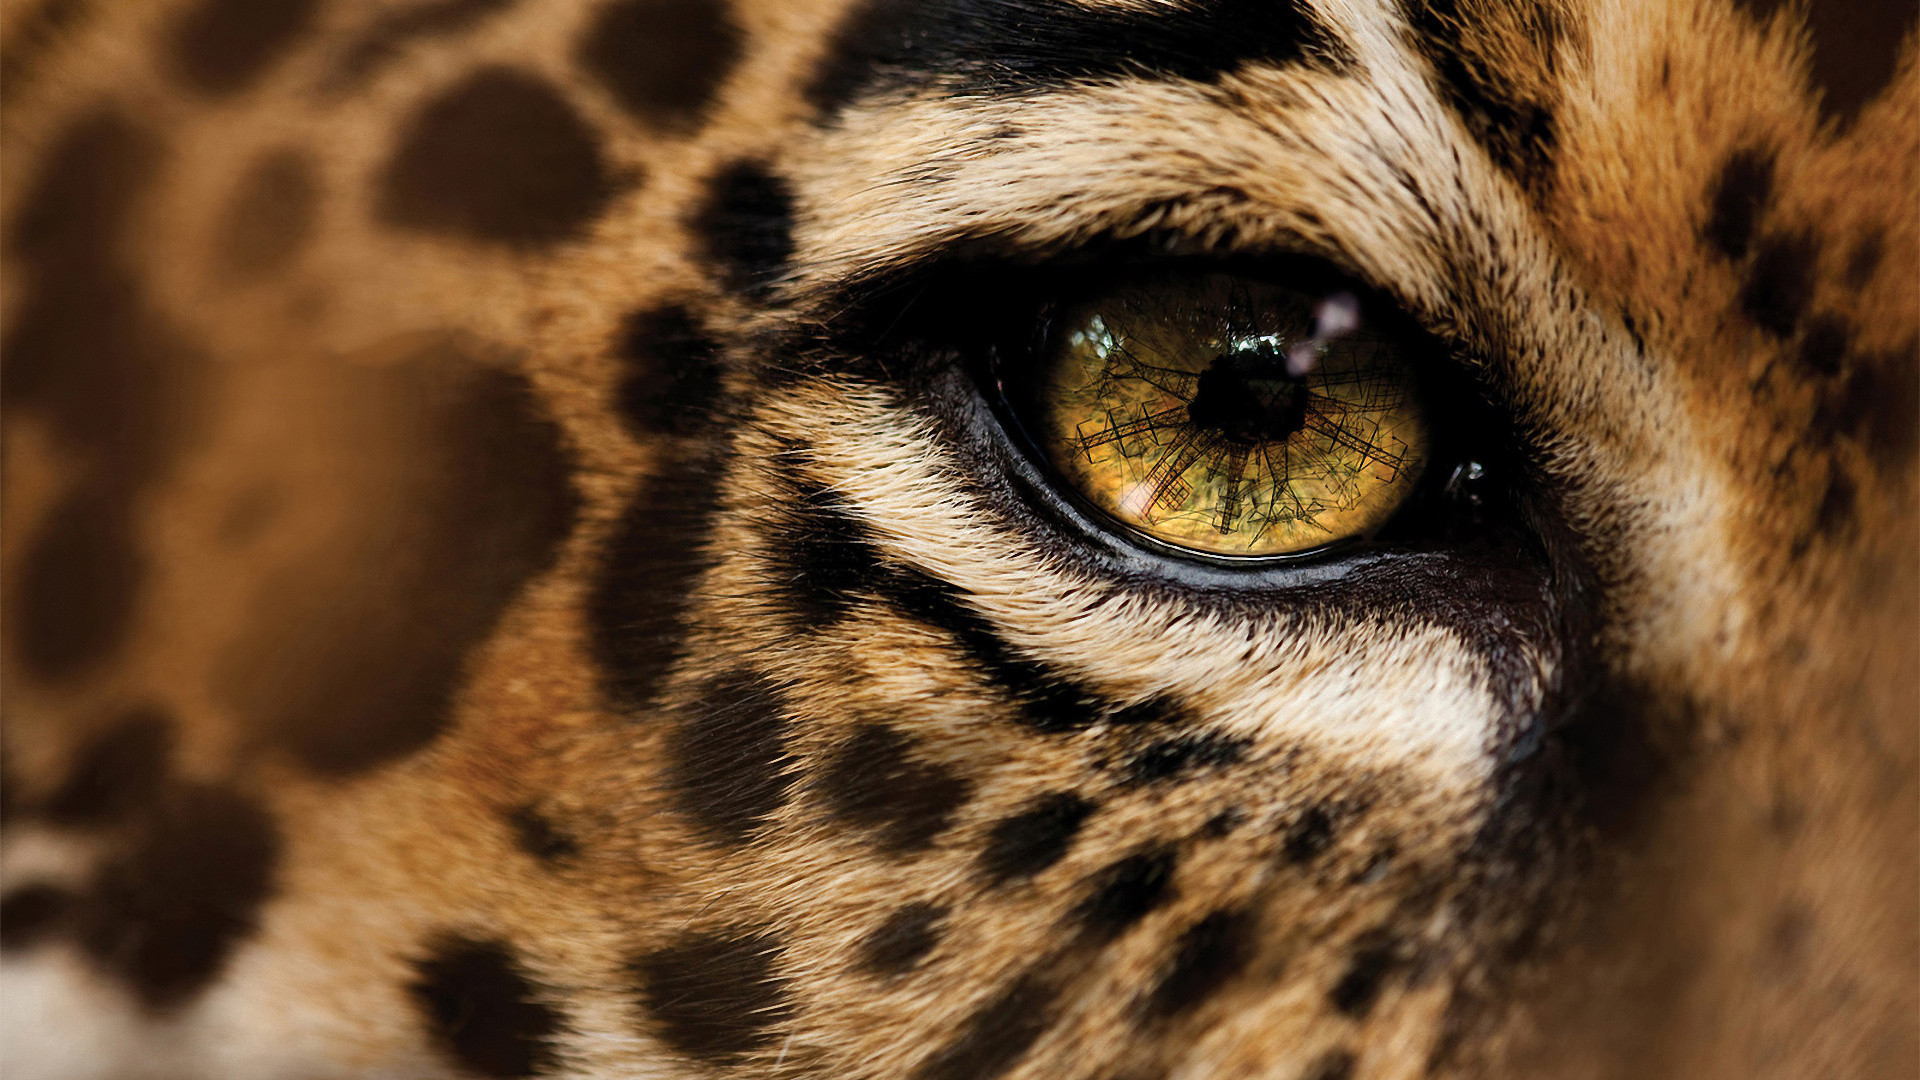 Cheetah Wallpaper Hd 183 ① Wallpapertag